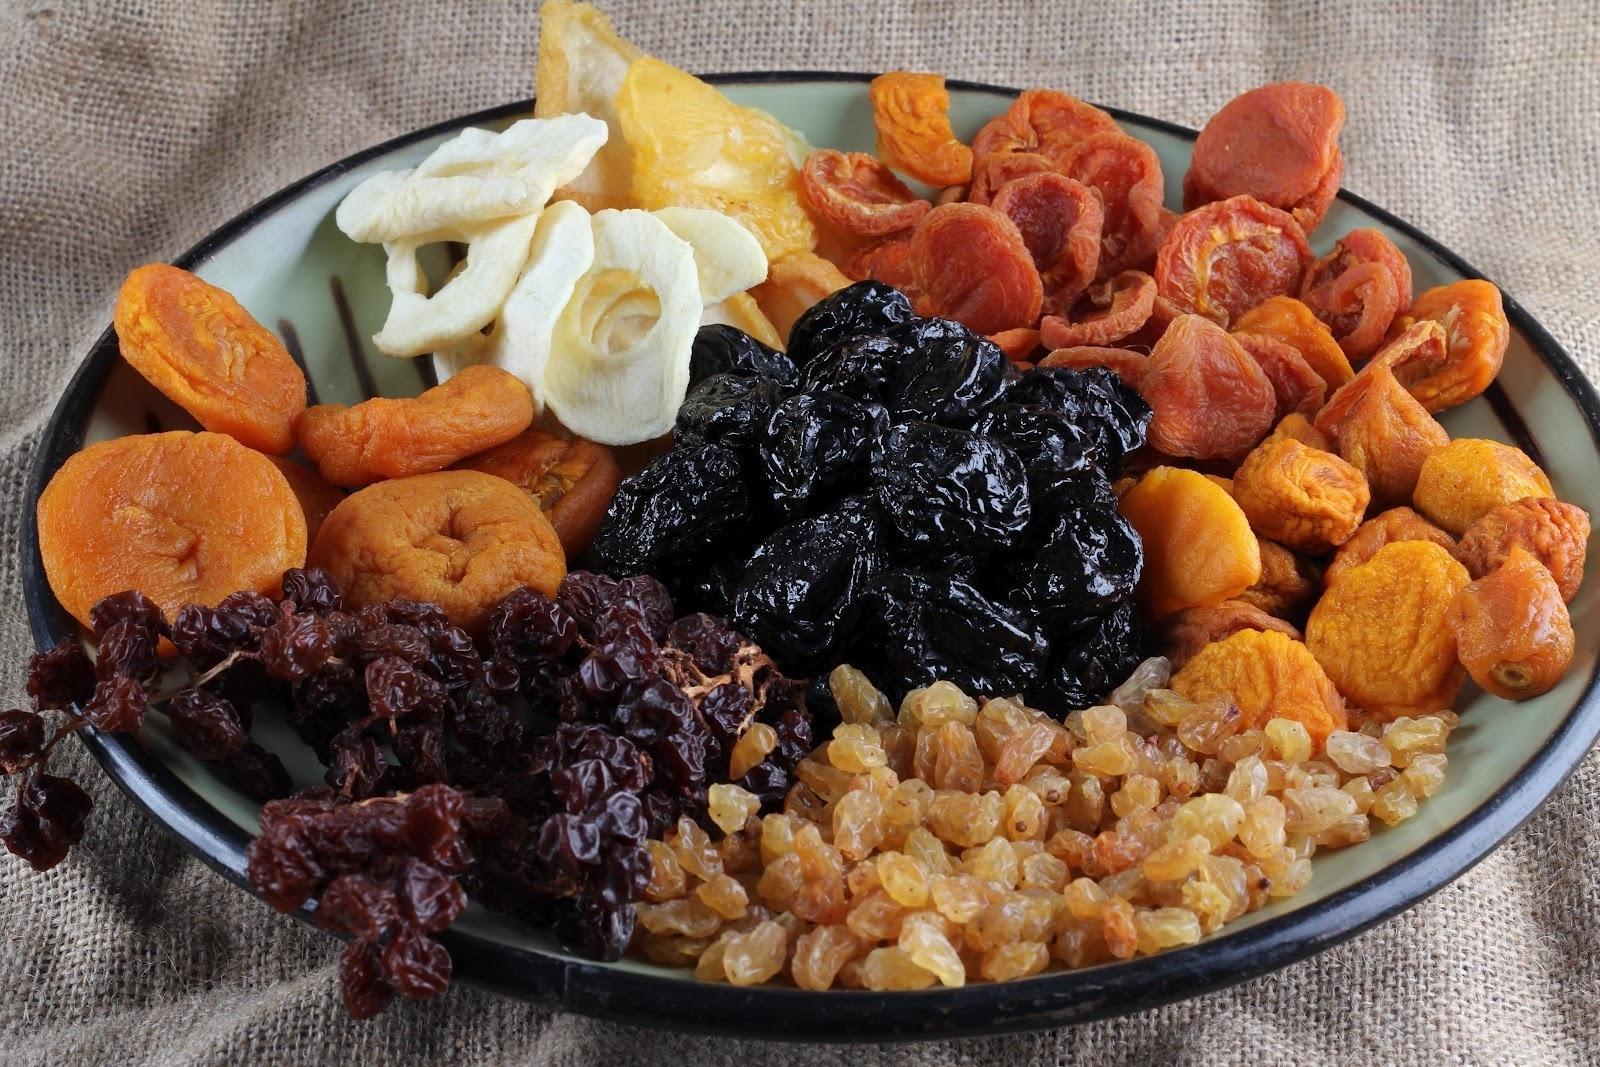 Saiba as Diferentes Propriedades Entre as Frutas e os Frutos Secos